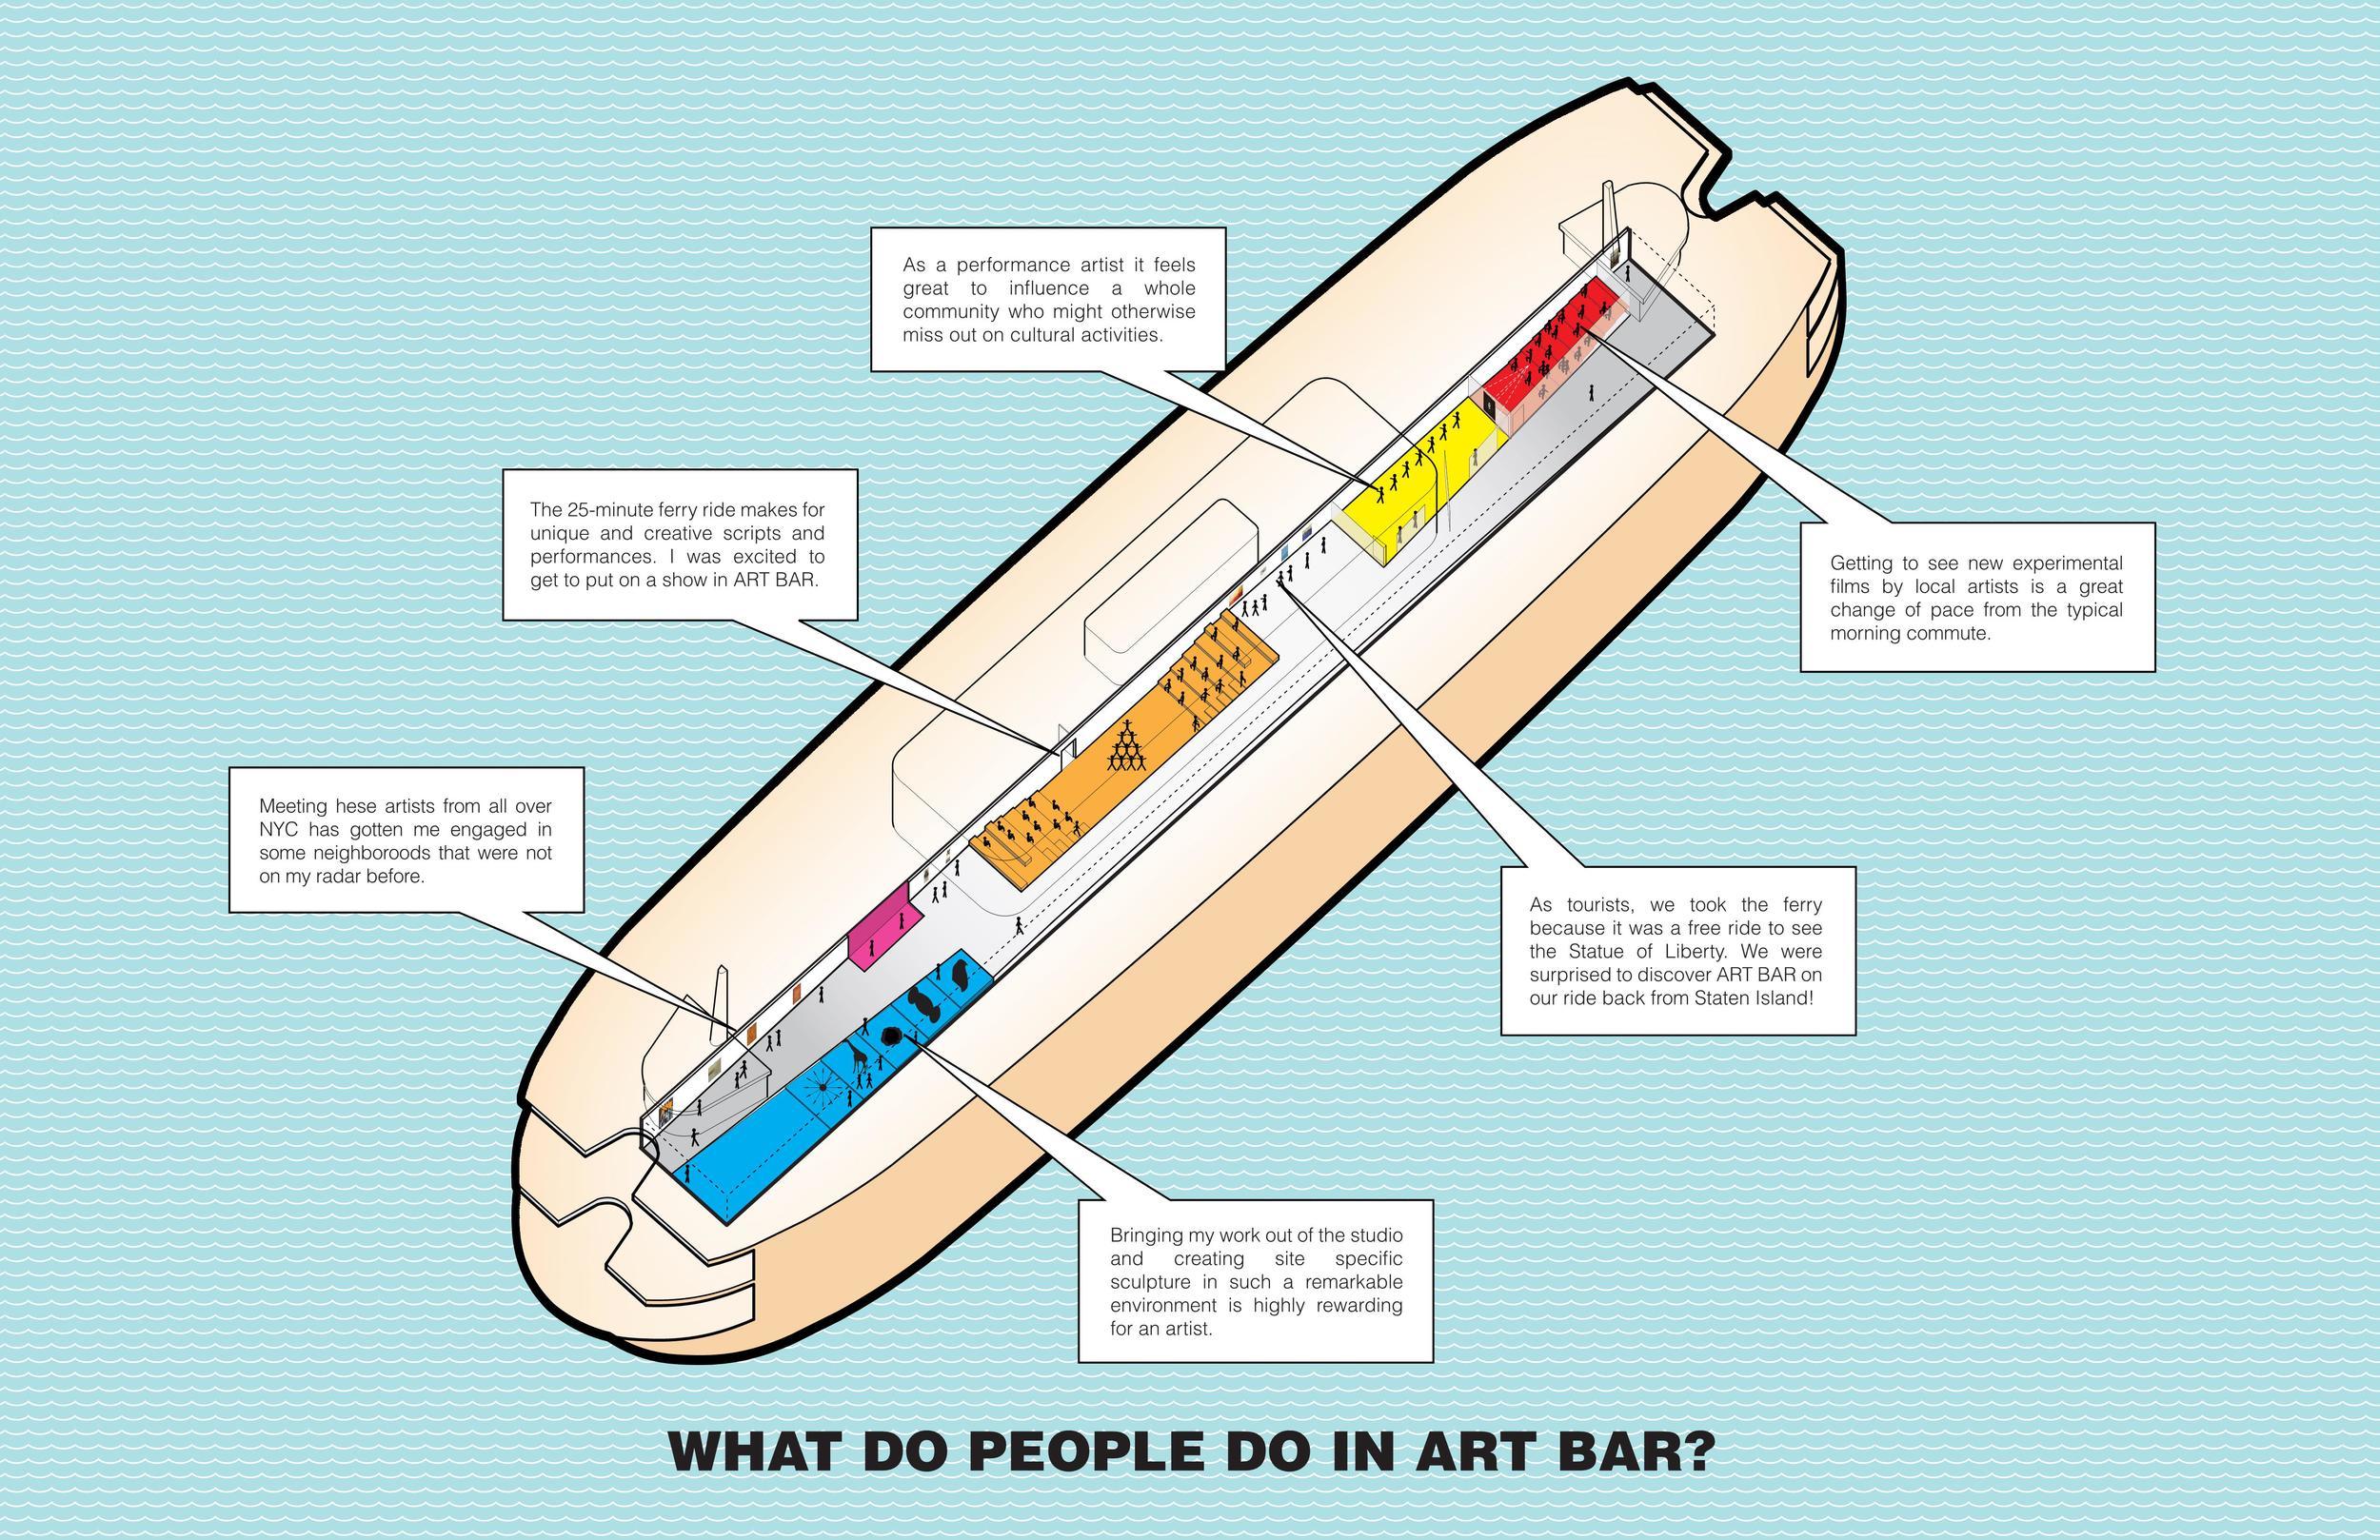 110731 - ART BAR Page 005.jpg